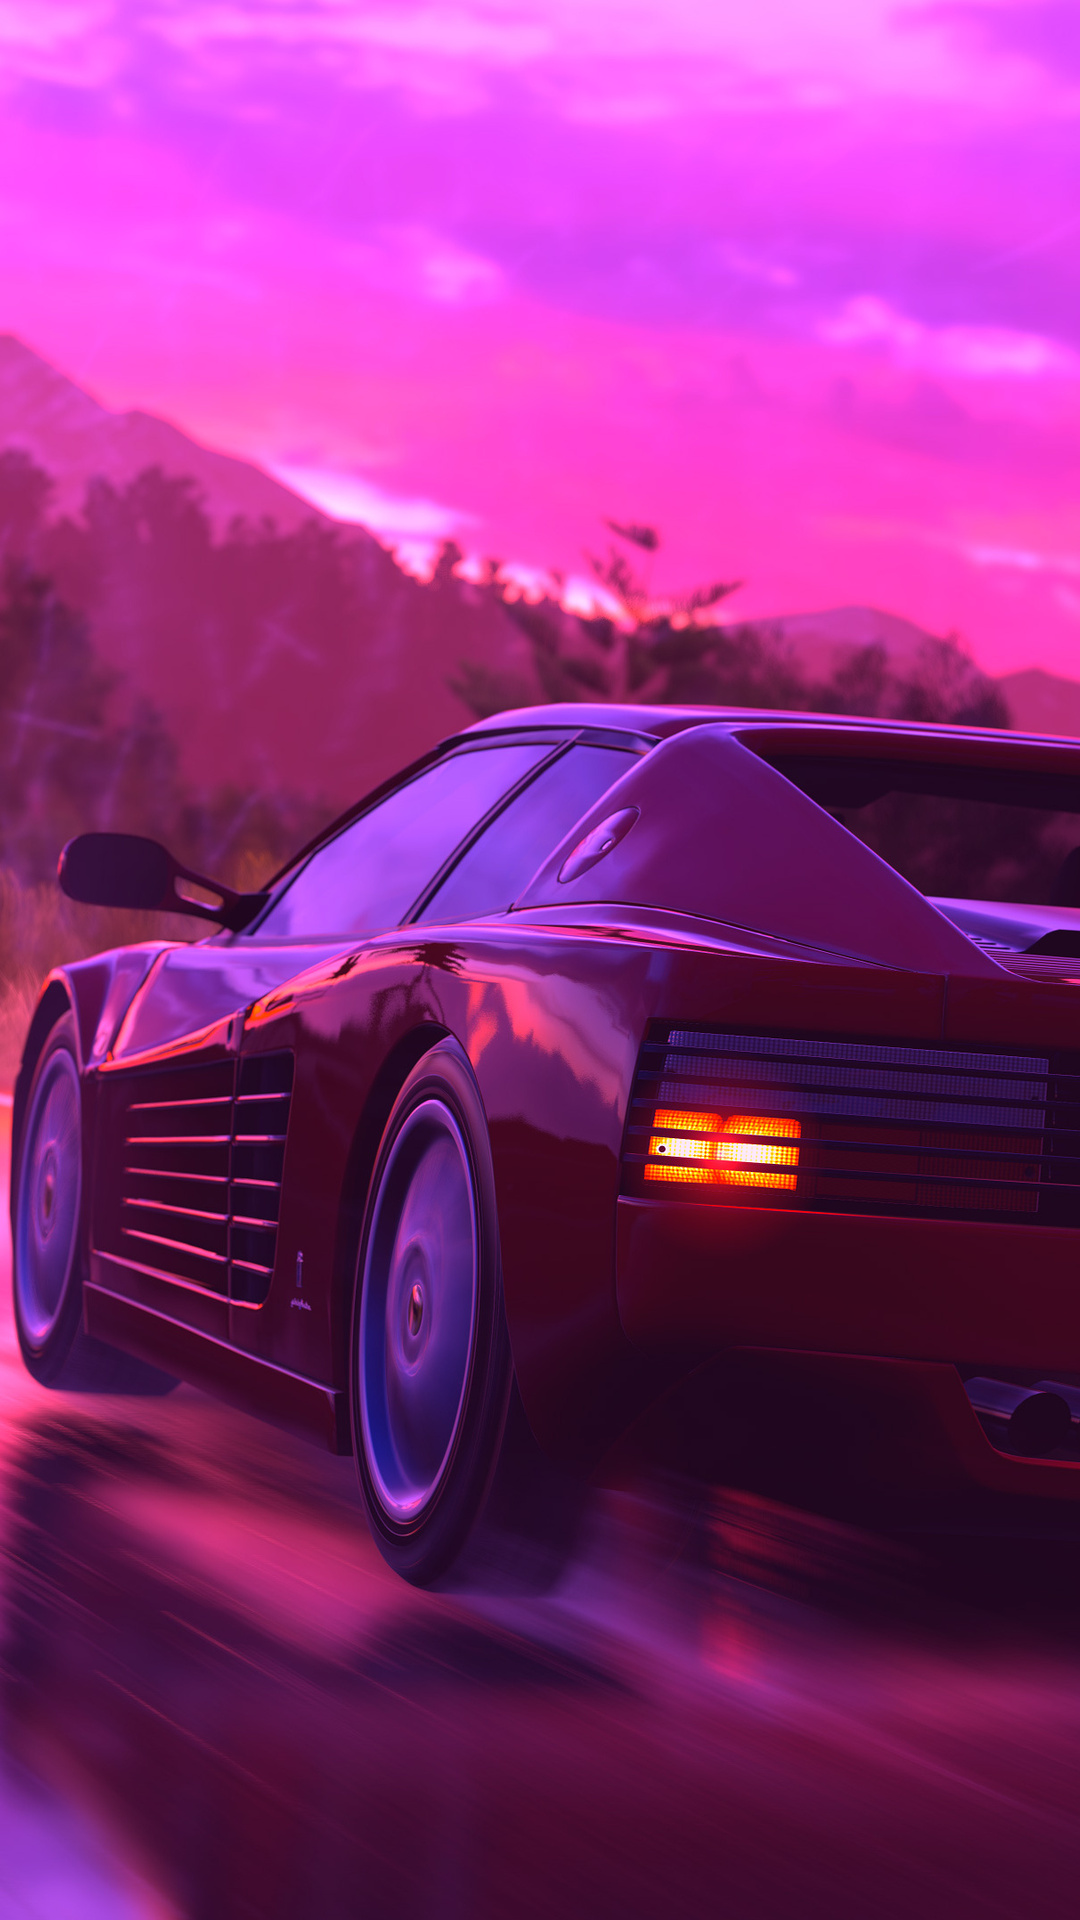 1080x1920 Ferrari Sports Car Retrowave Art 4k Iphone 7 6s 6 Plus